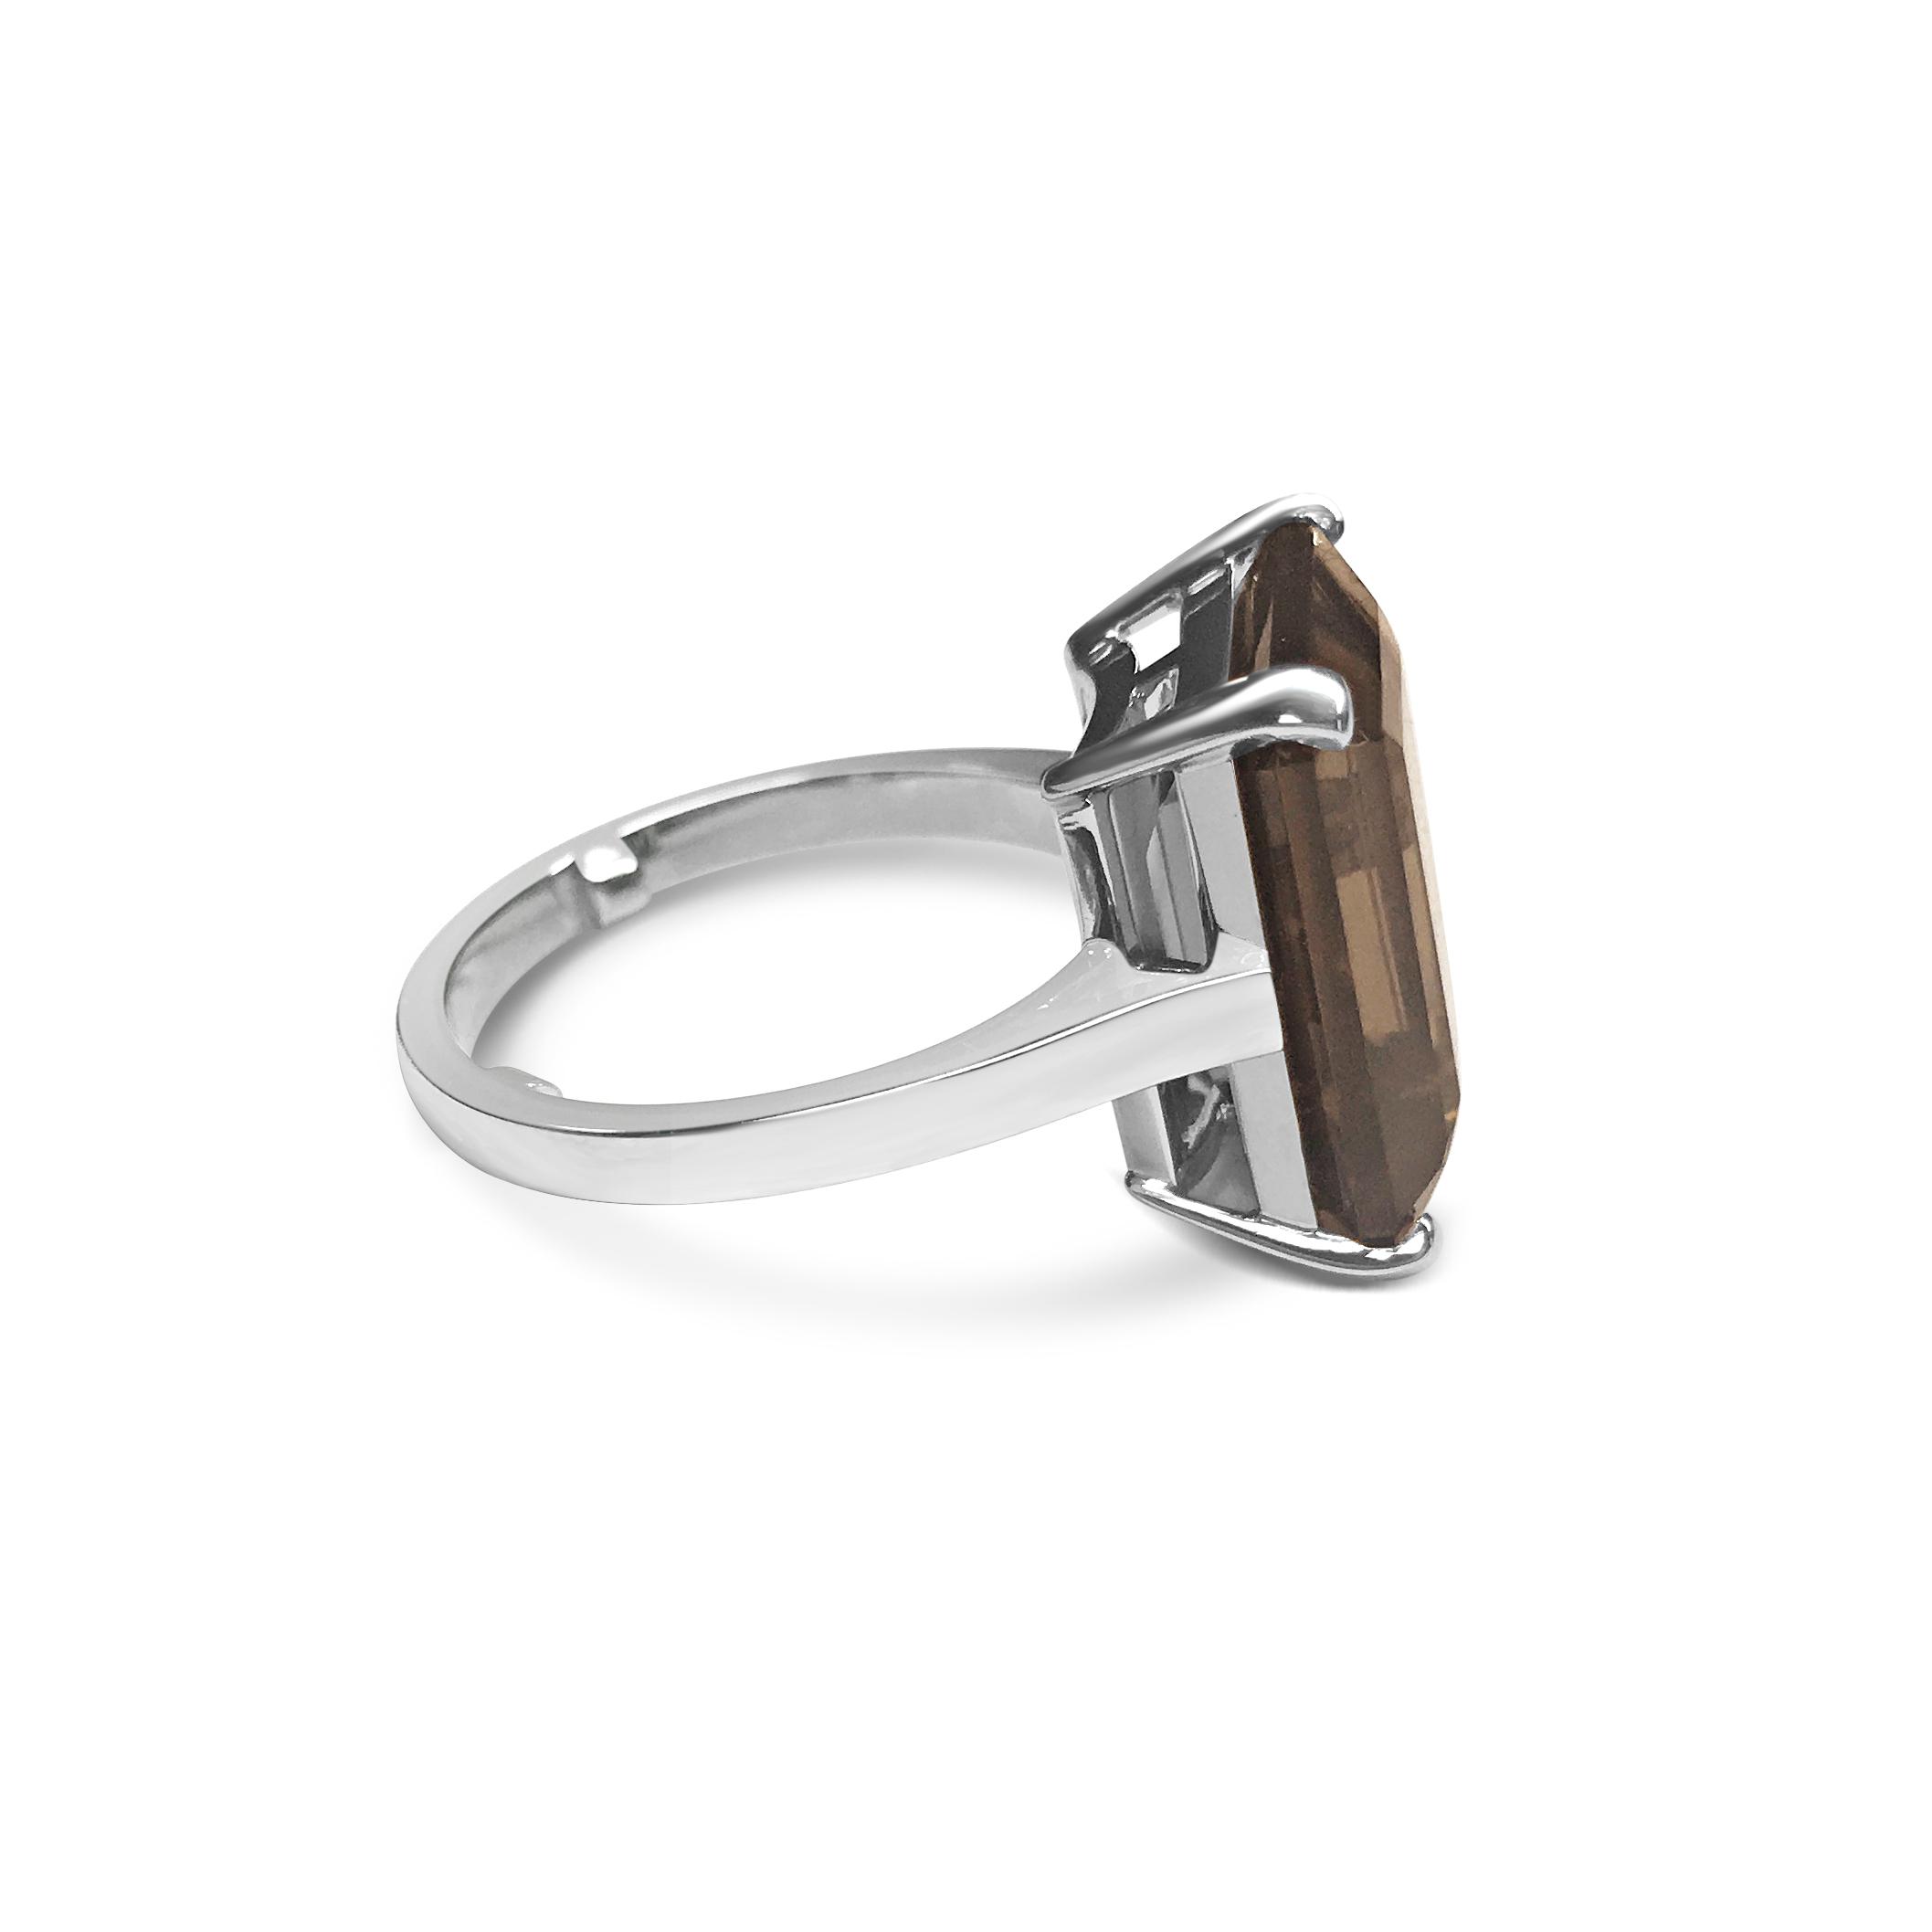 smokey-quartz-and-platinum-four-claw-ring-2.jpg